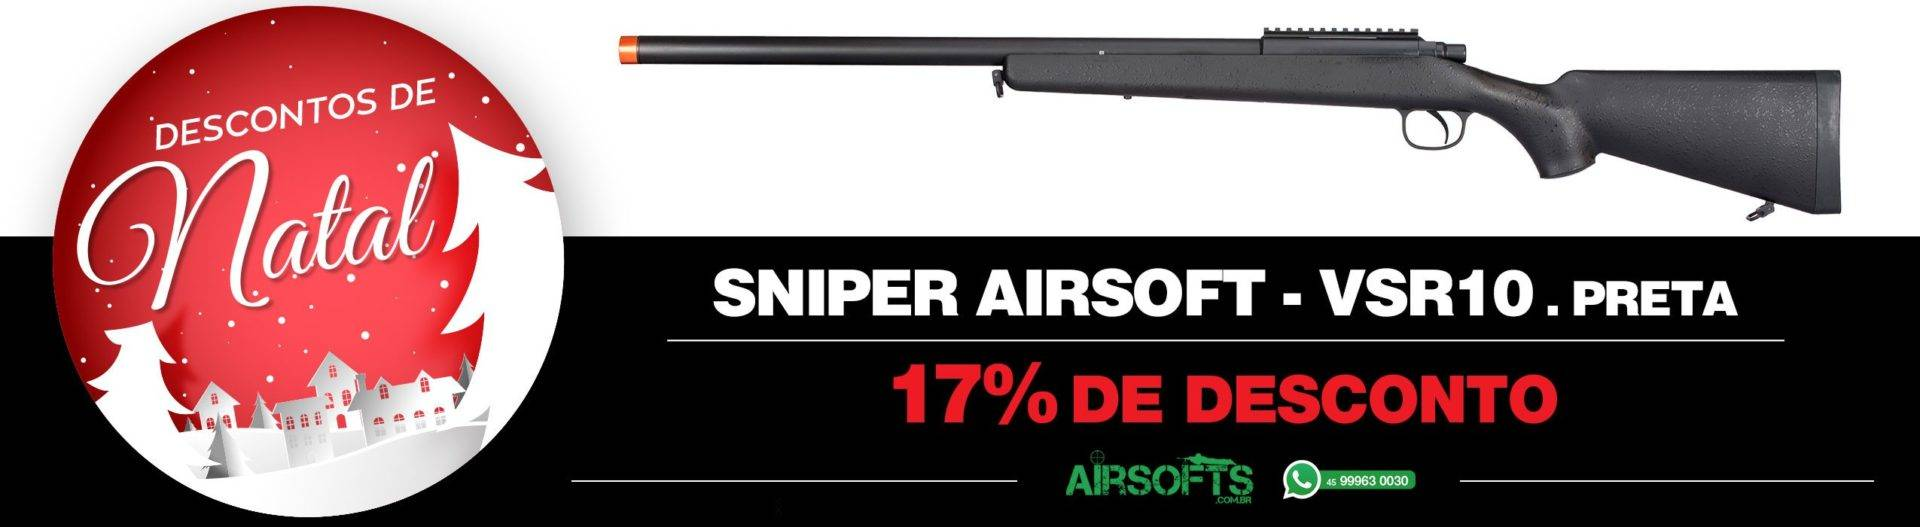 sniper airsofts